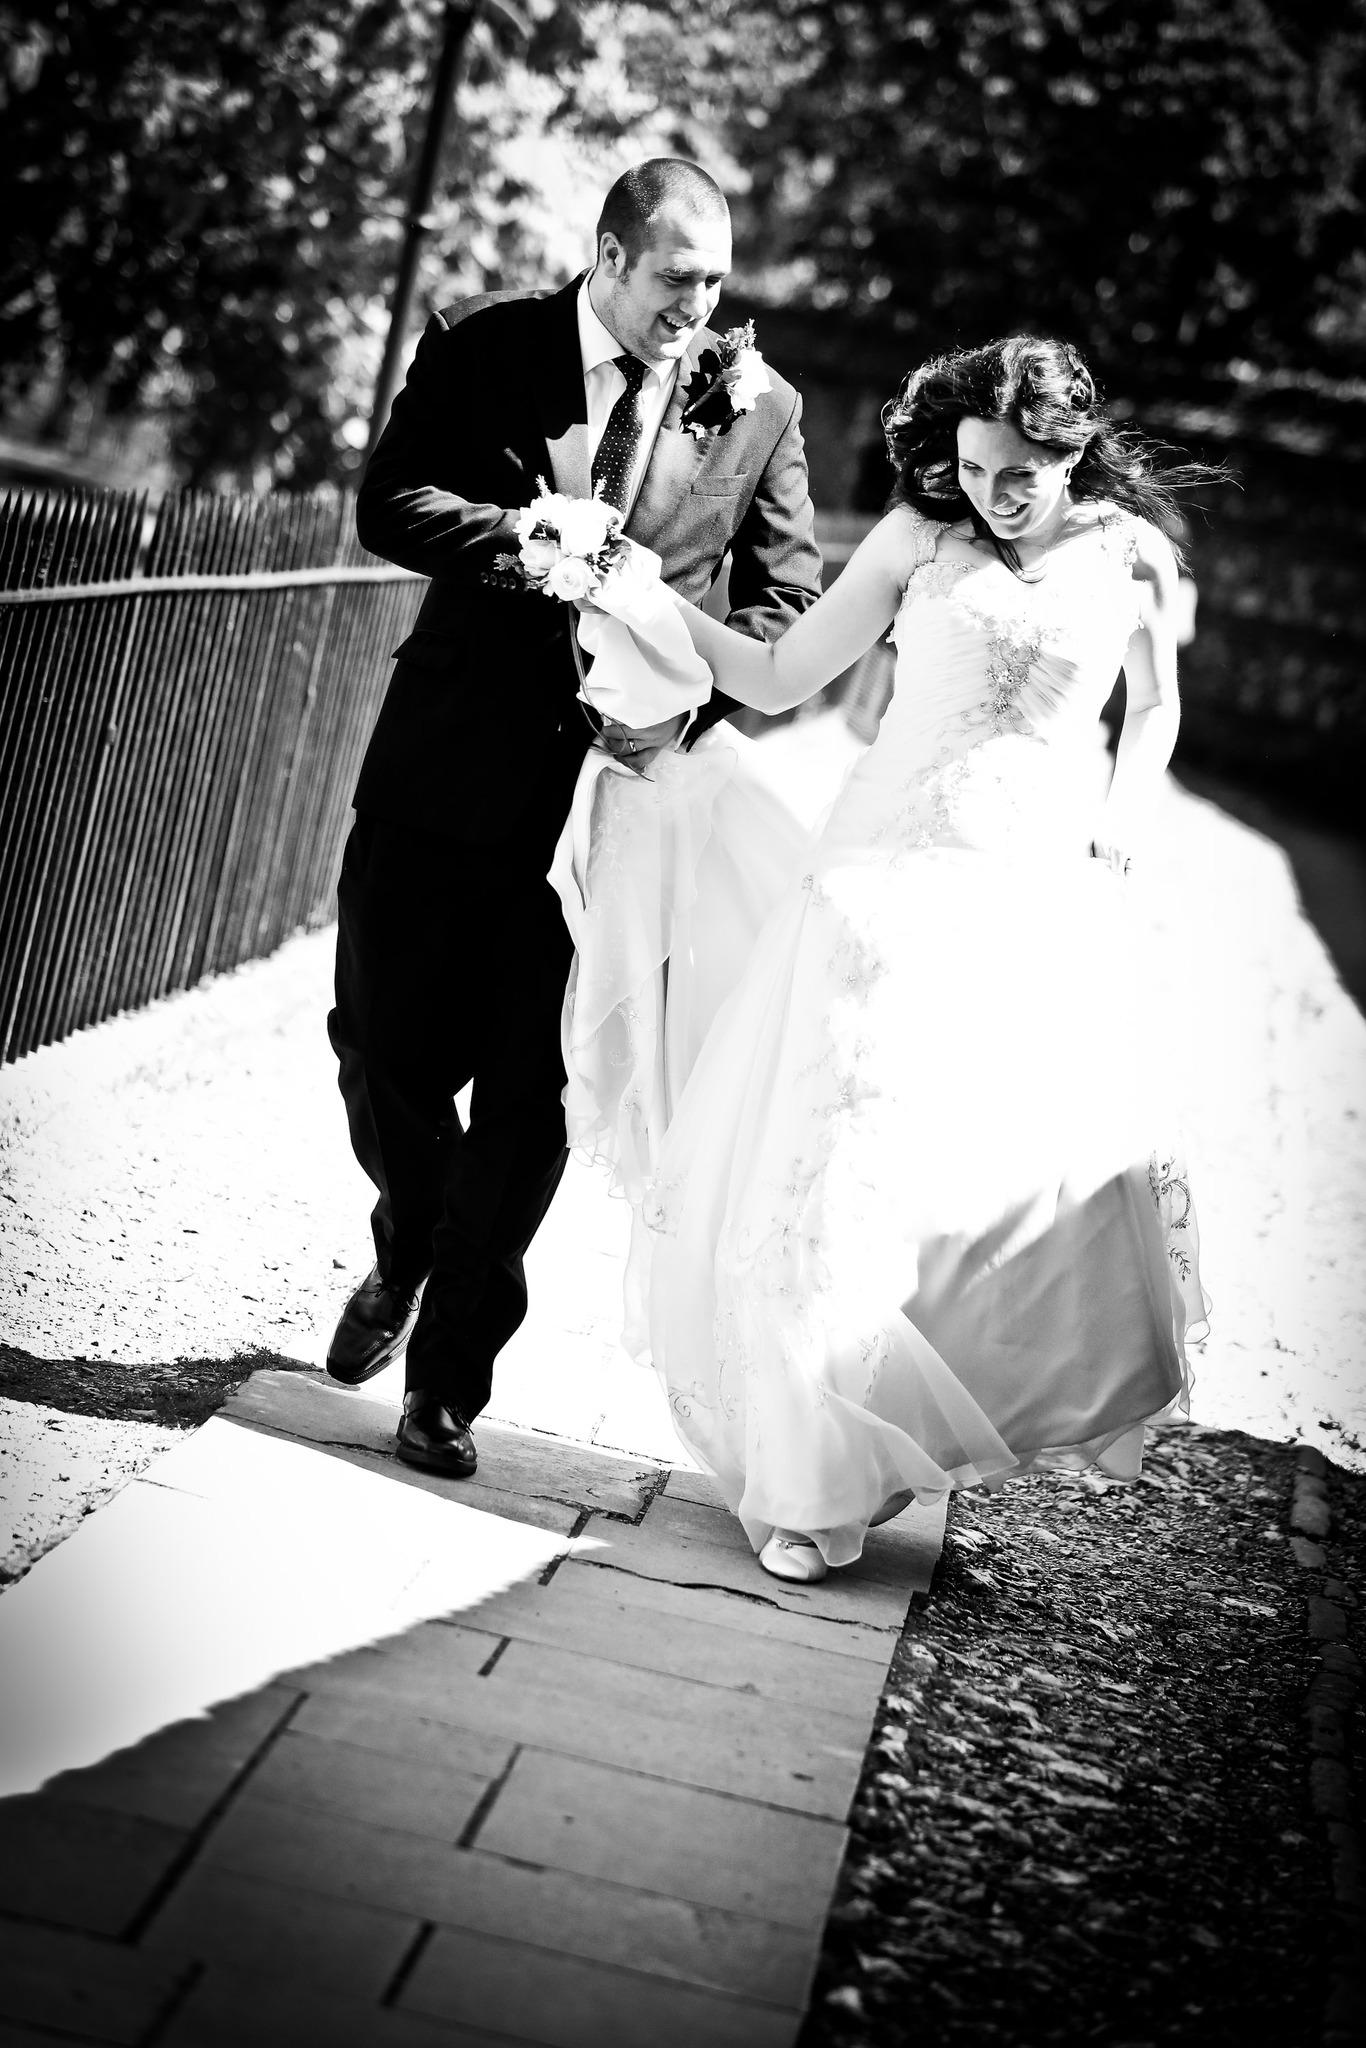 FBW_Summer_Weddings_037.jpg